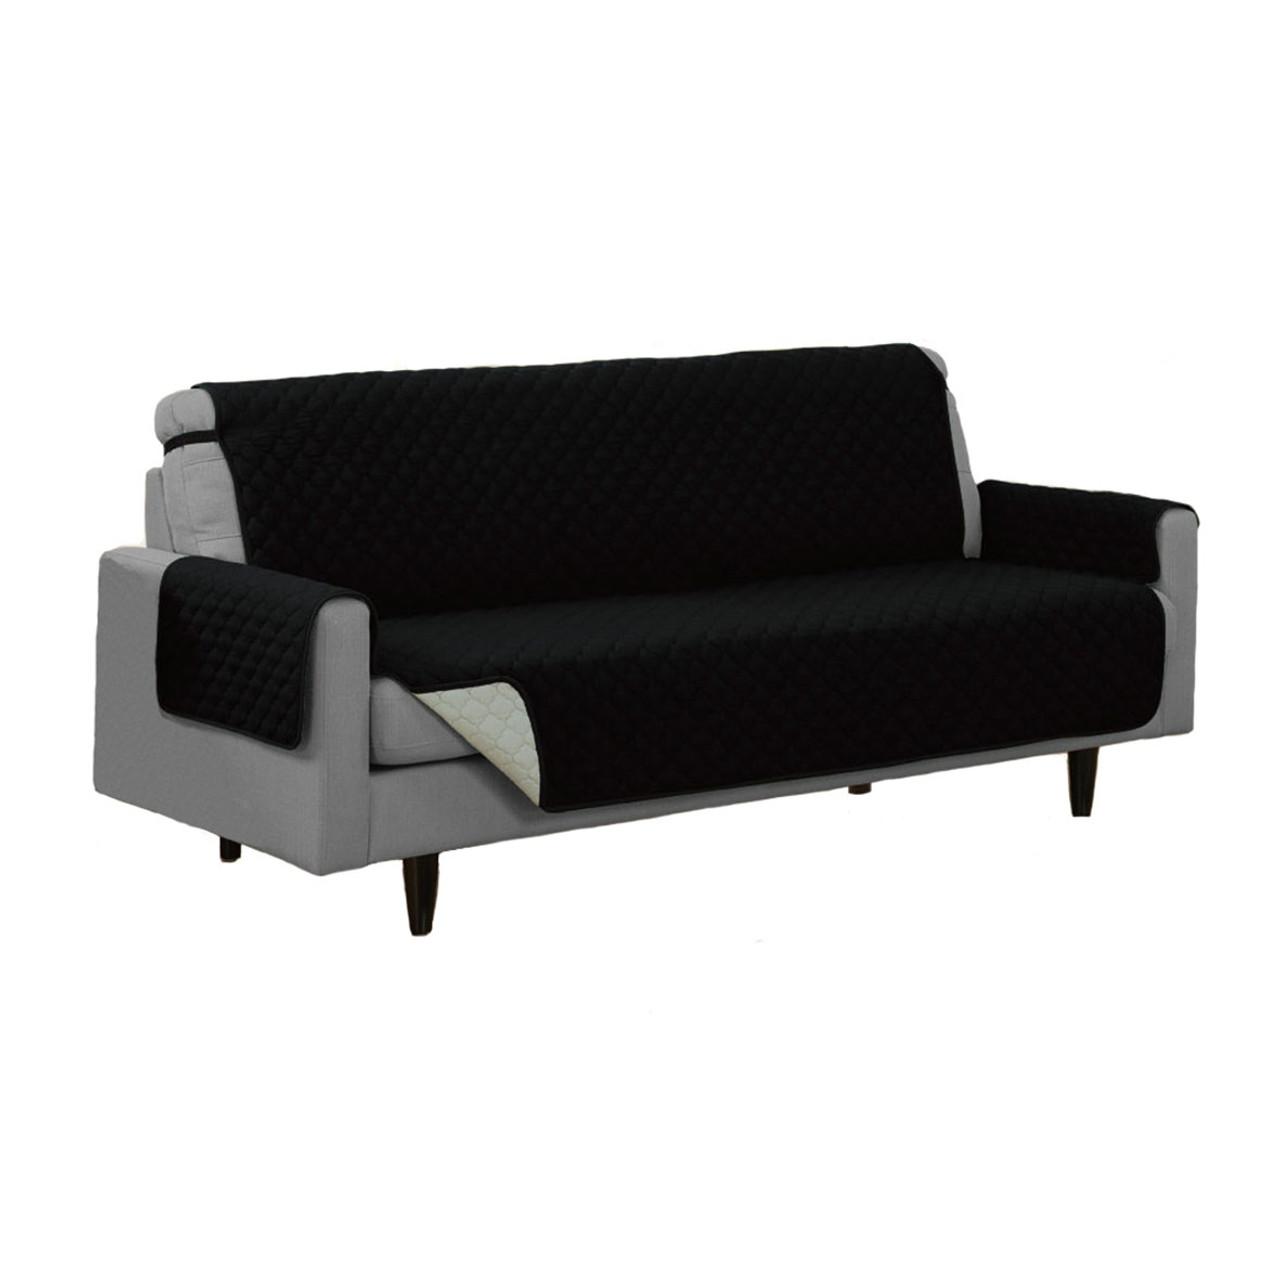 Reversible Furniture Protector Microfiber Pet Couch Sofa Chair  e86242c0c758